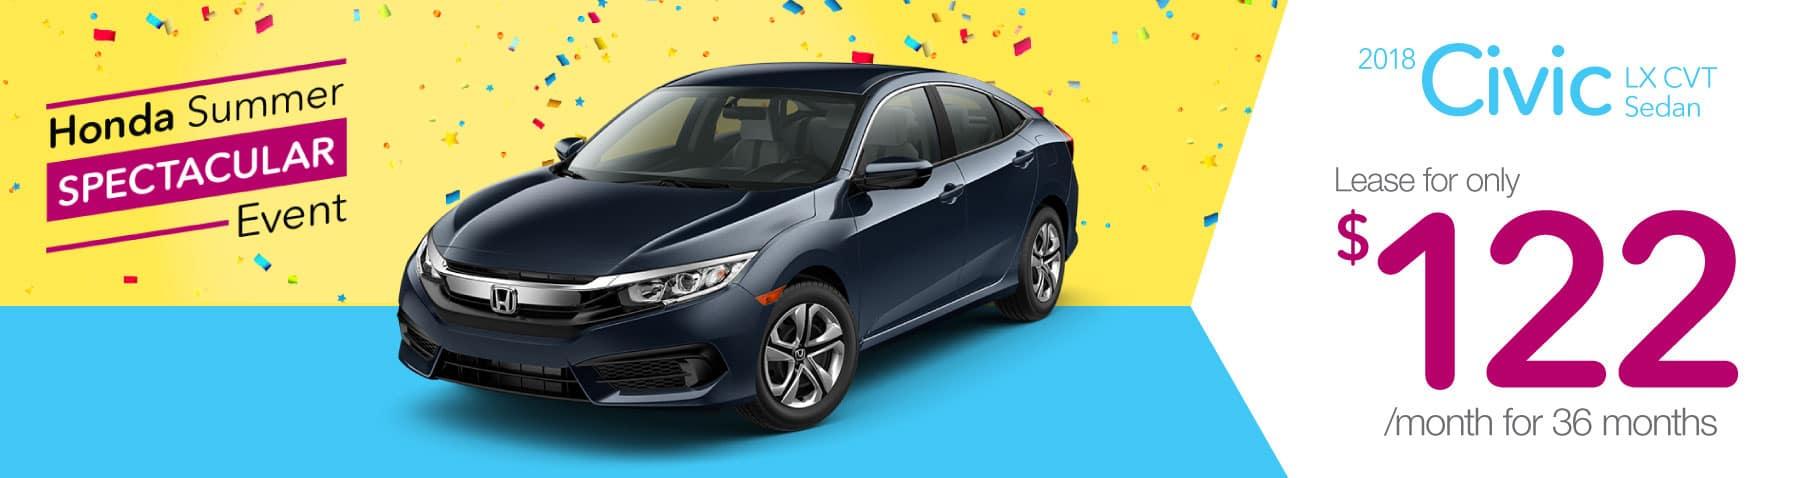 Header Photo of the new 2018 Honda Civic